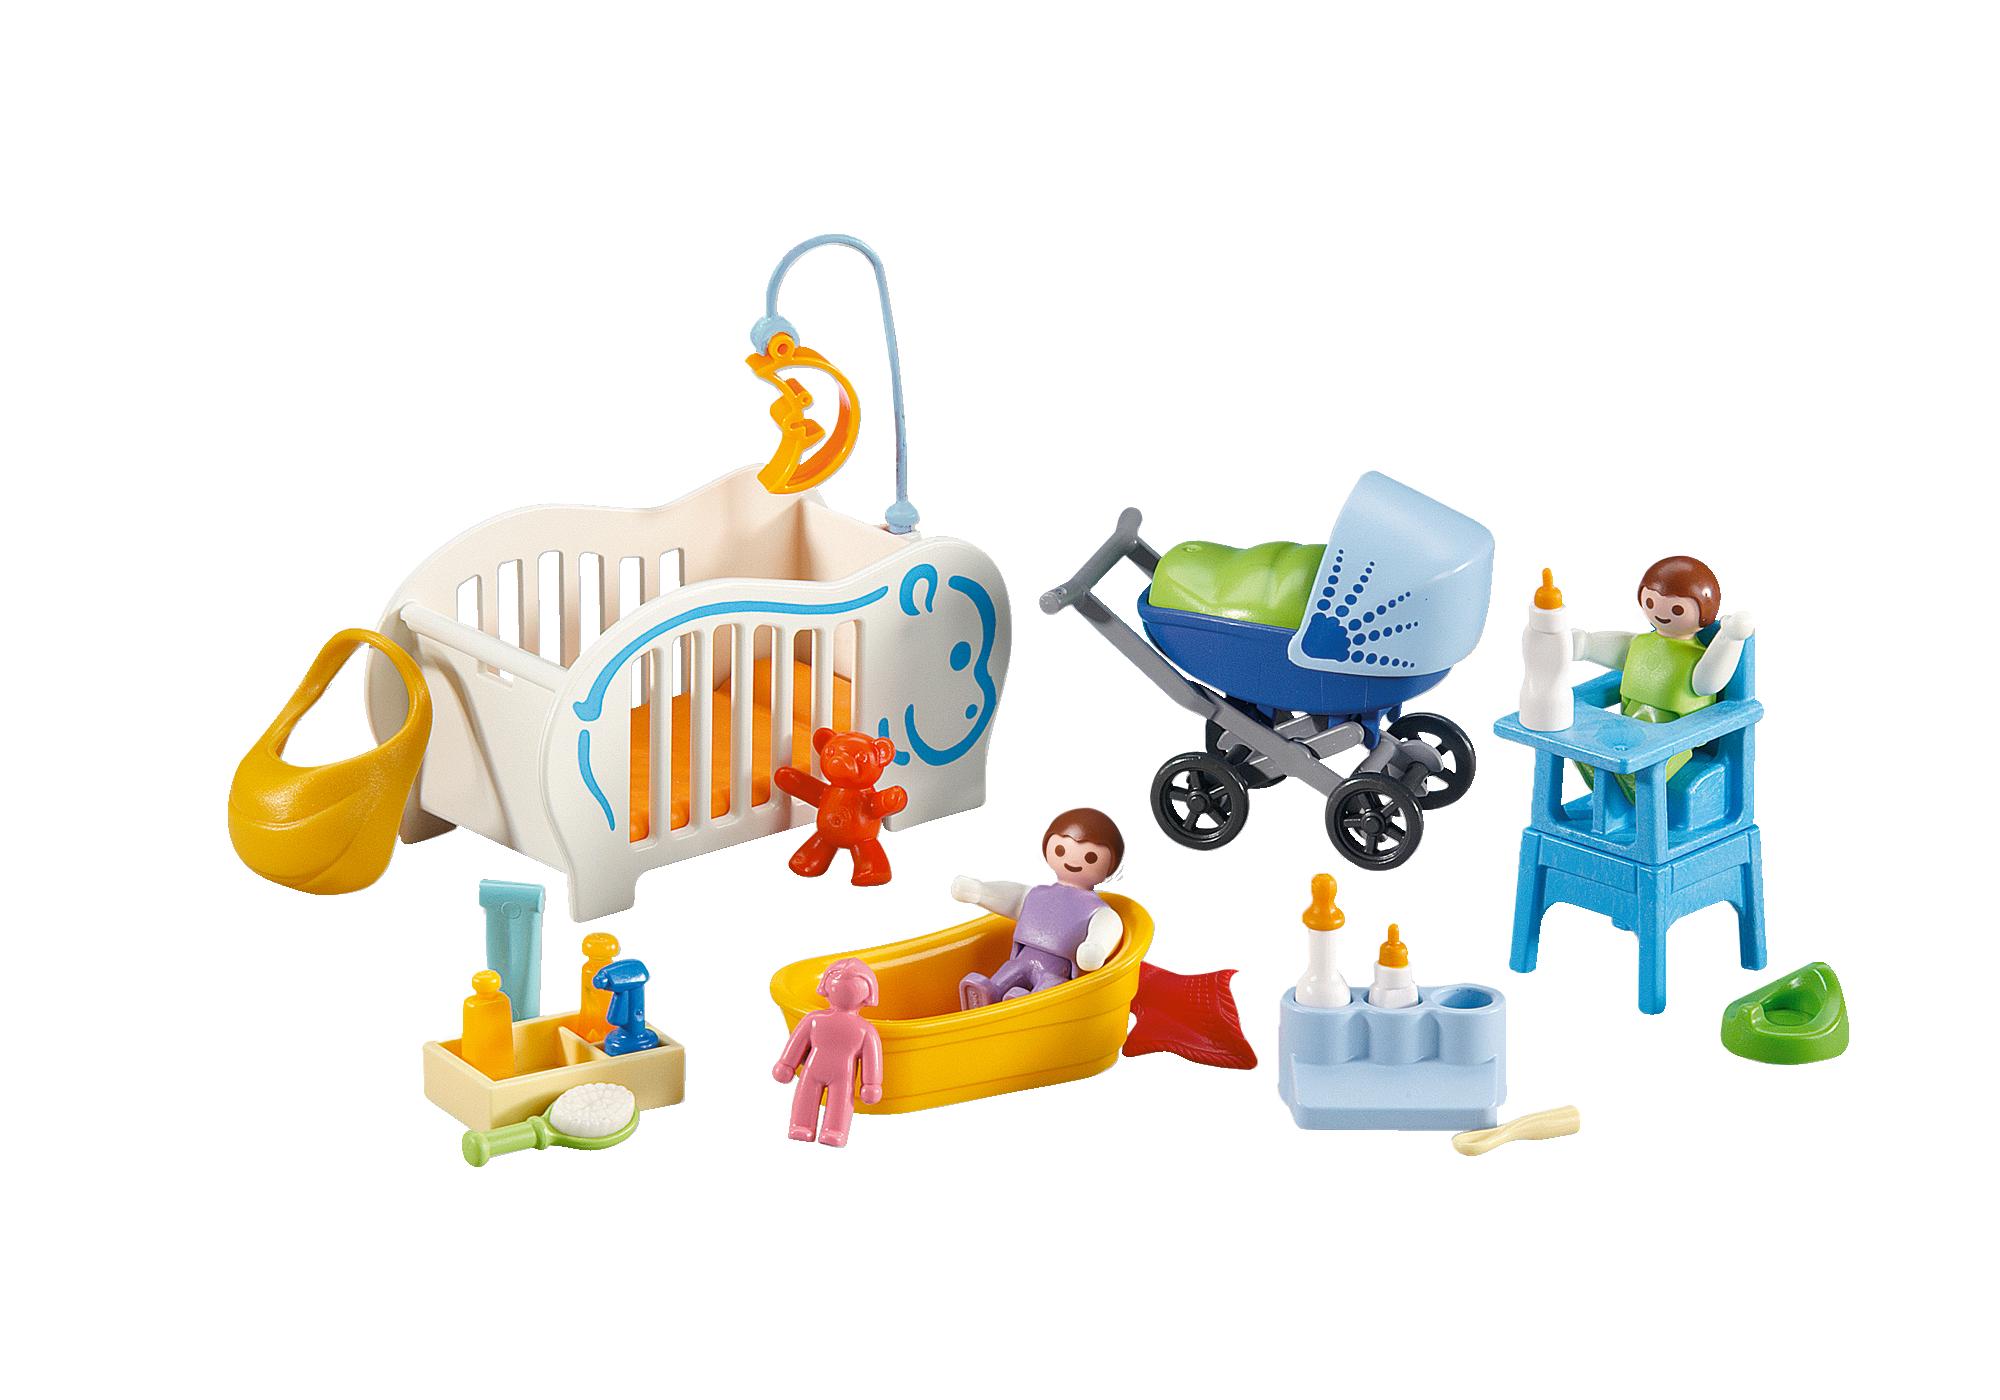 http://media.playmobil.com/i/playmobil/6226_product_detail/Baby-Erstausstattung